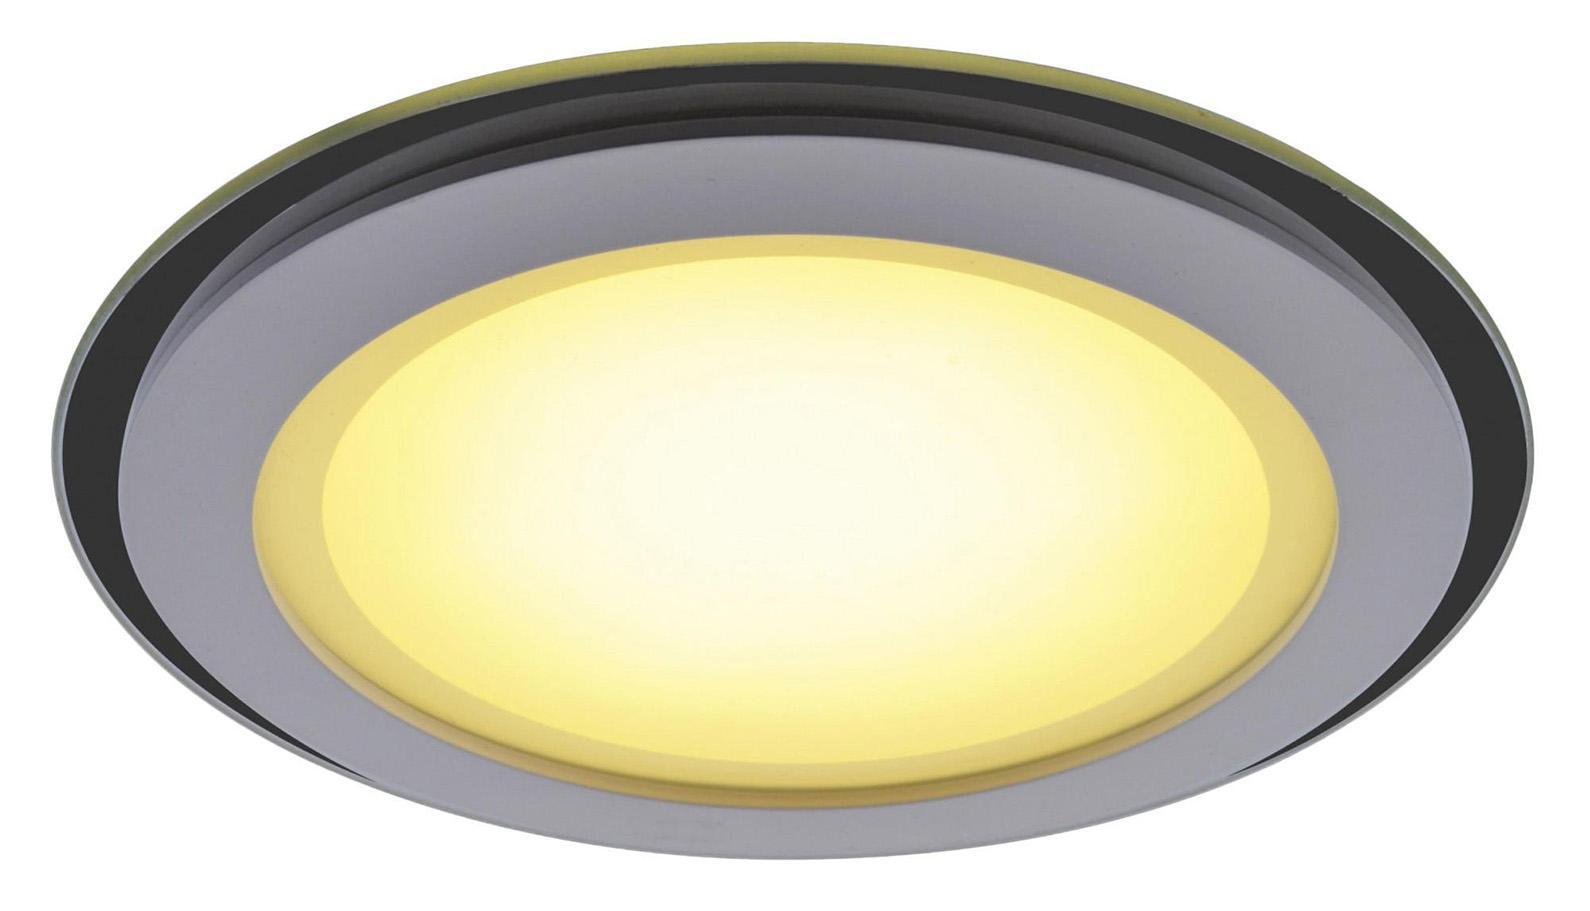 A4118PL-1WH RAGGIO Встраиваемый светильникA4118PL-1WH18W LED; 1440 lm